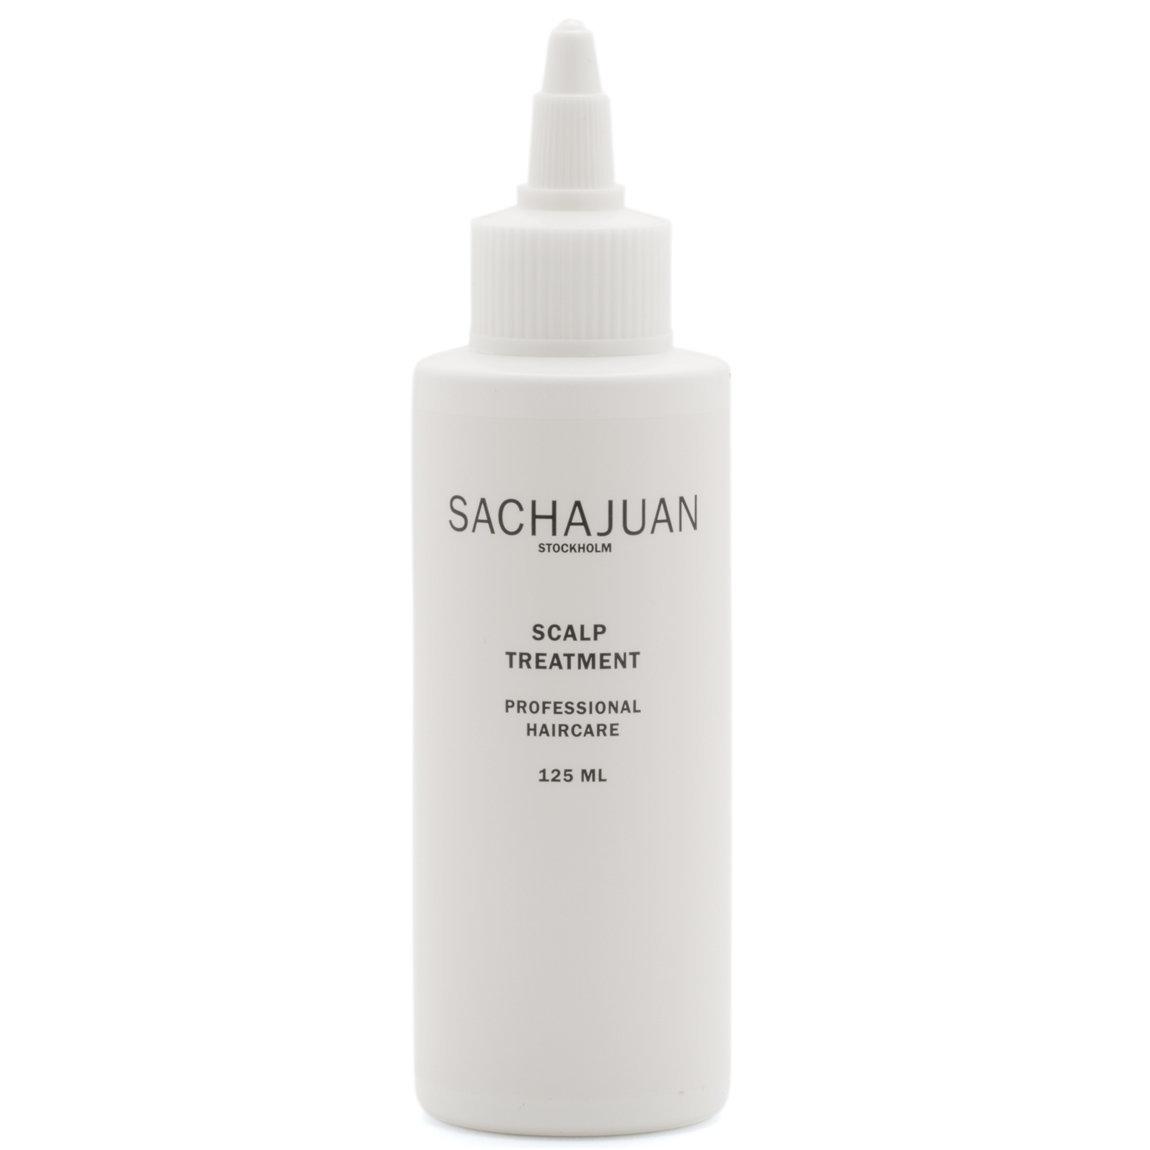 SACHAJUAN Scalp Treatment product swatch.